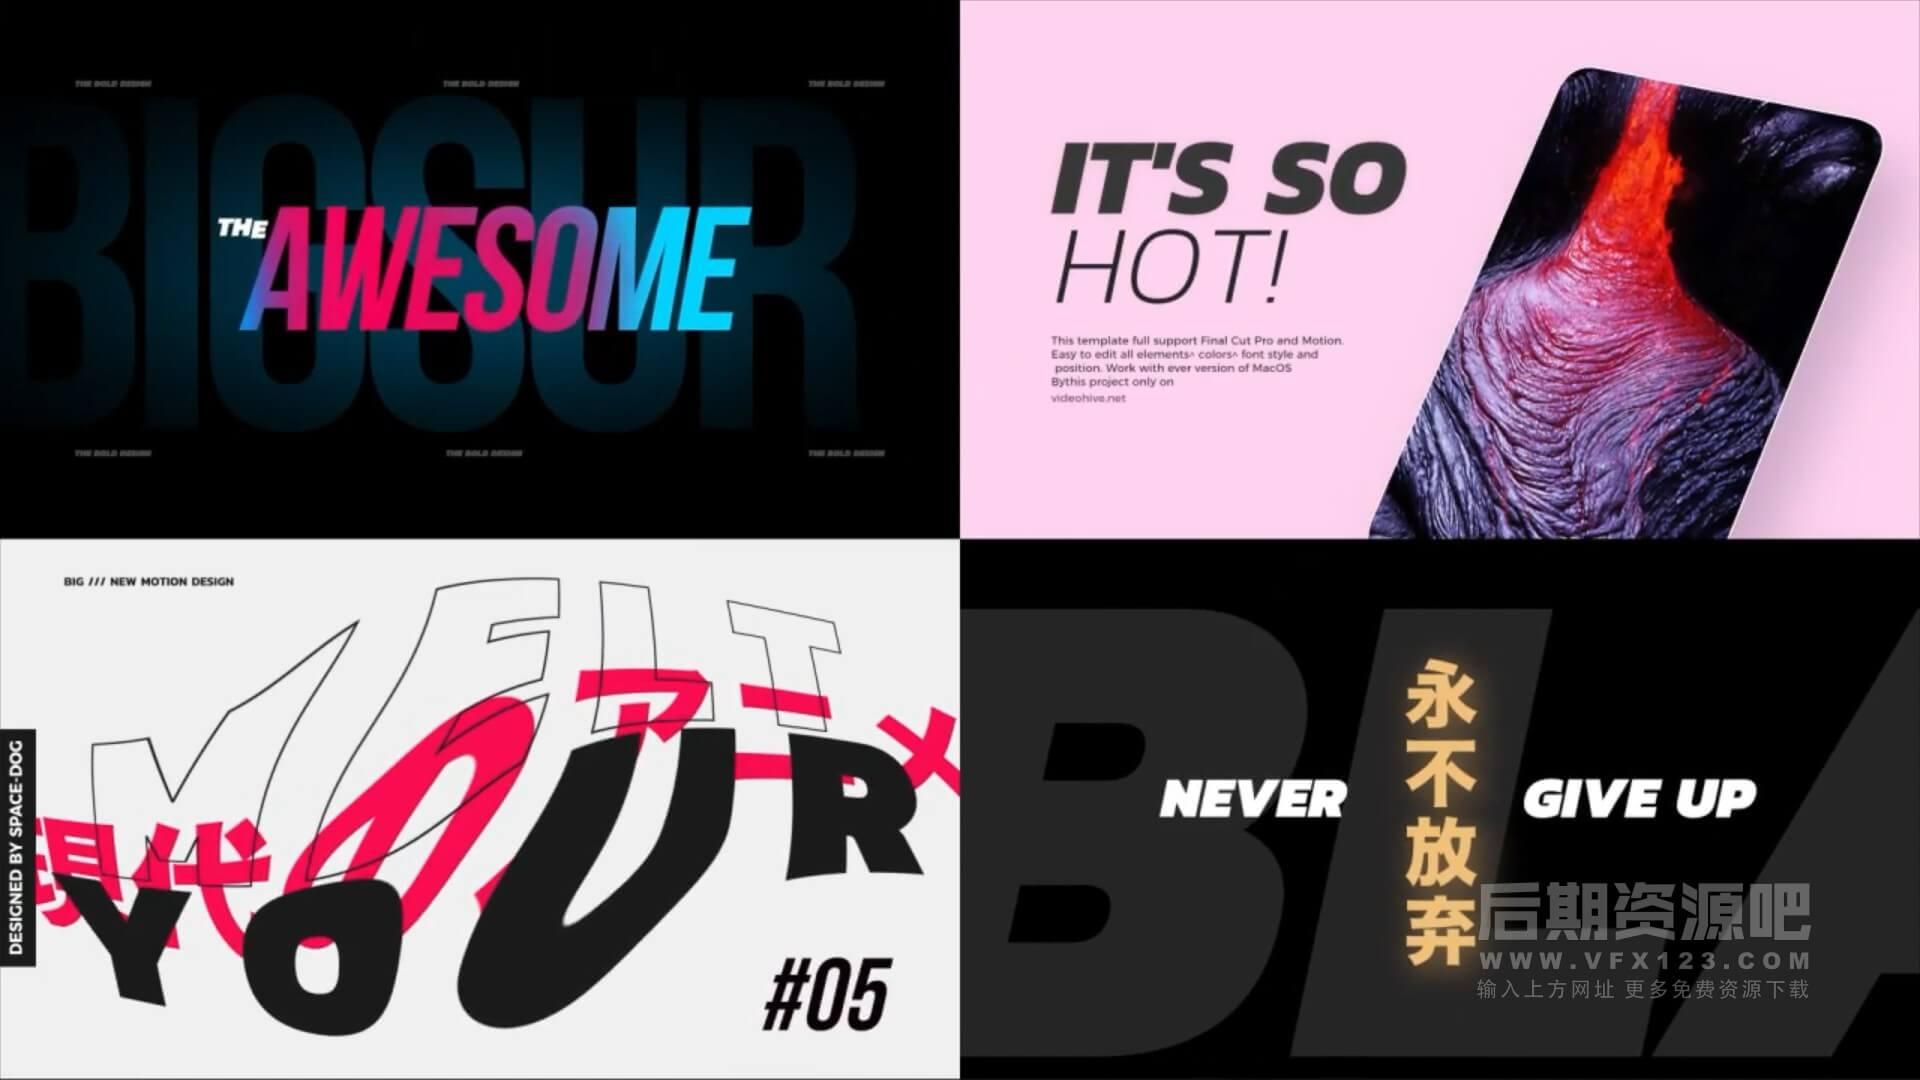 fcpx插件 20组彩色促销标题版式设计动画模板 Promo Typography